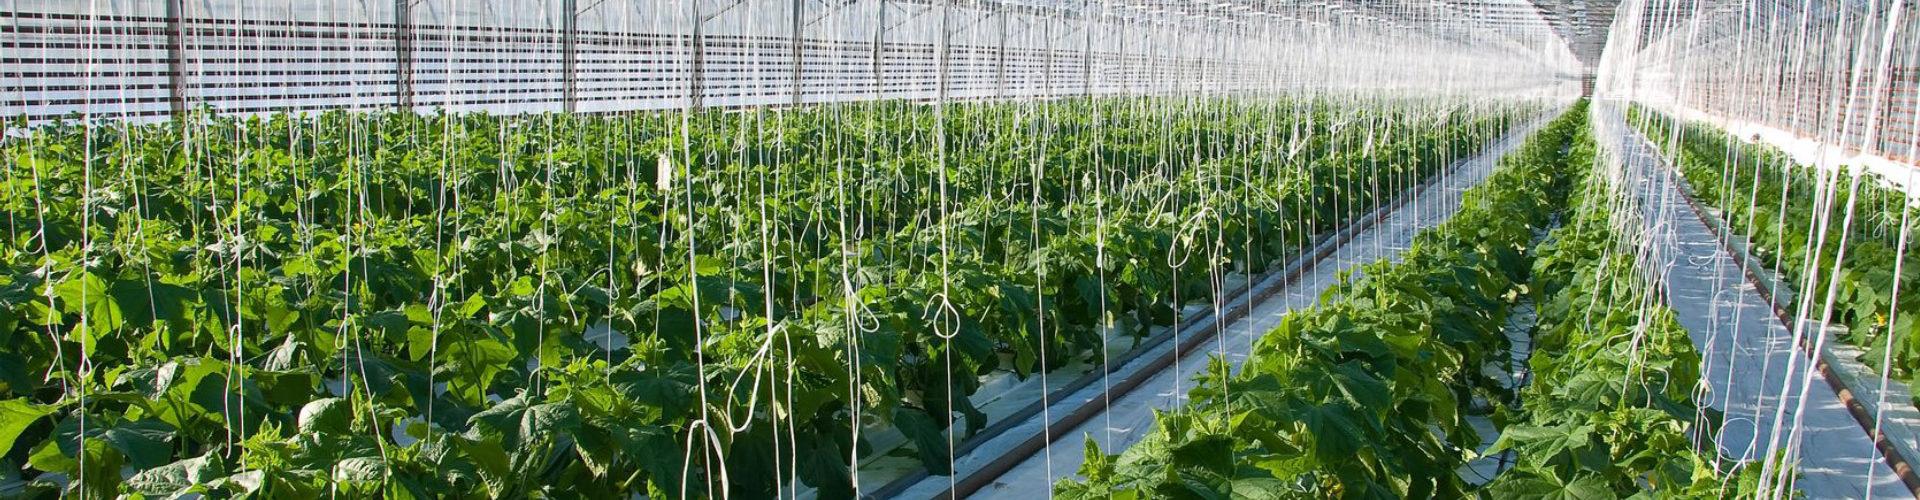 Agroculture Banner